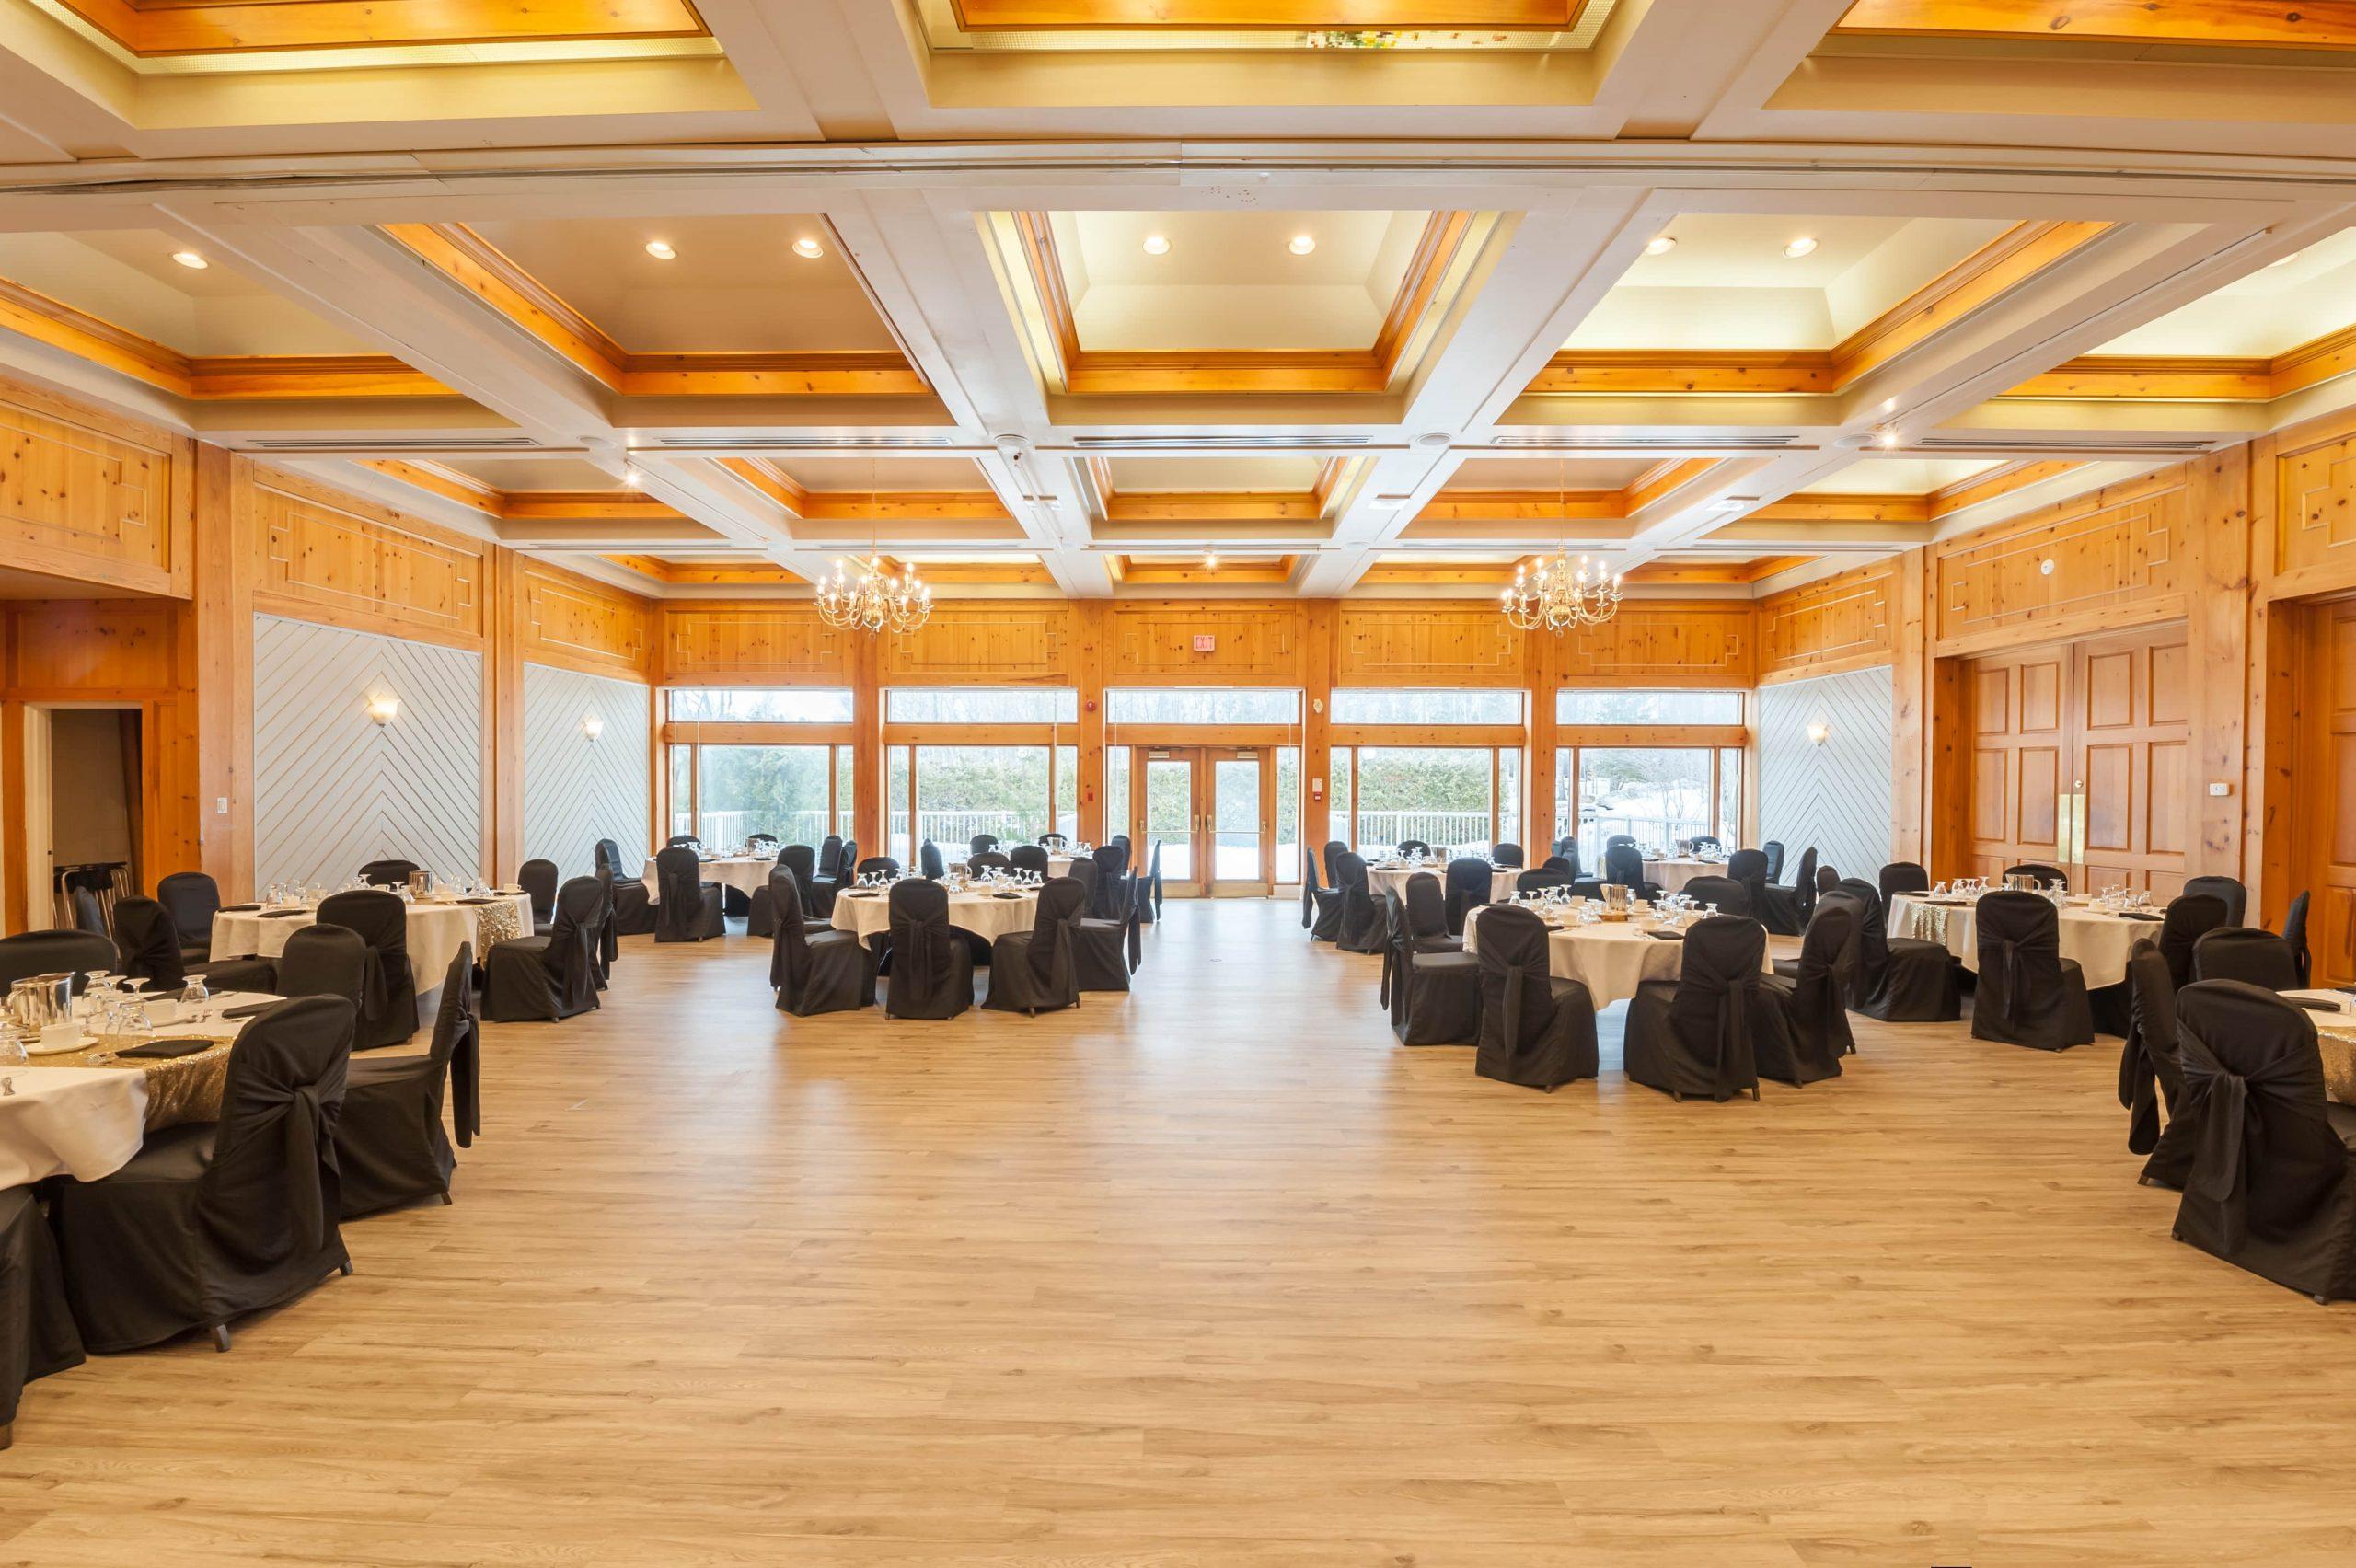 Ballroom-3 (1)